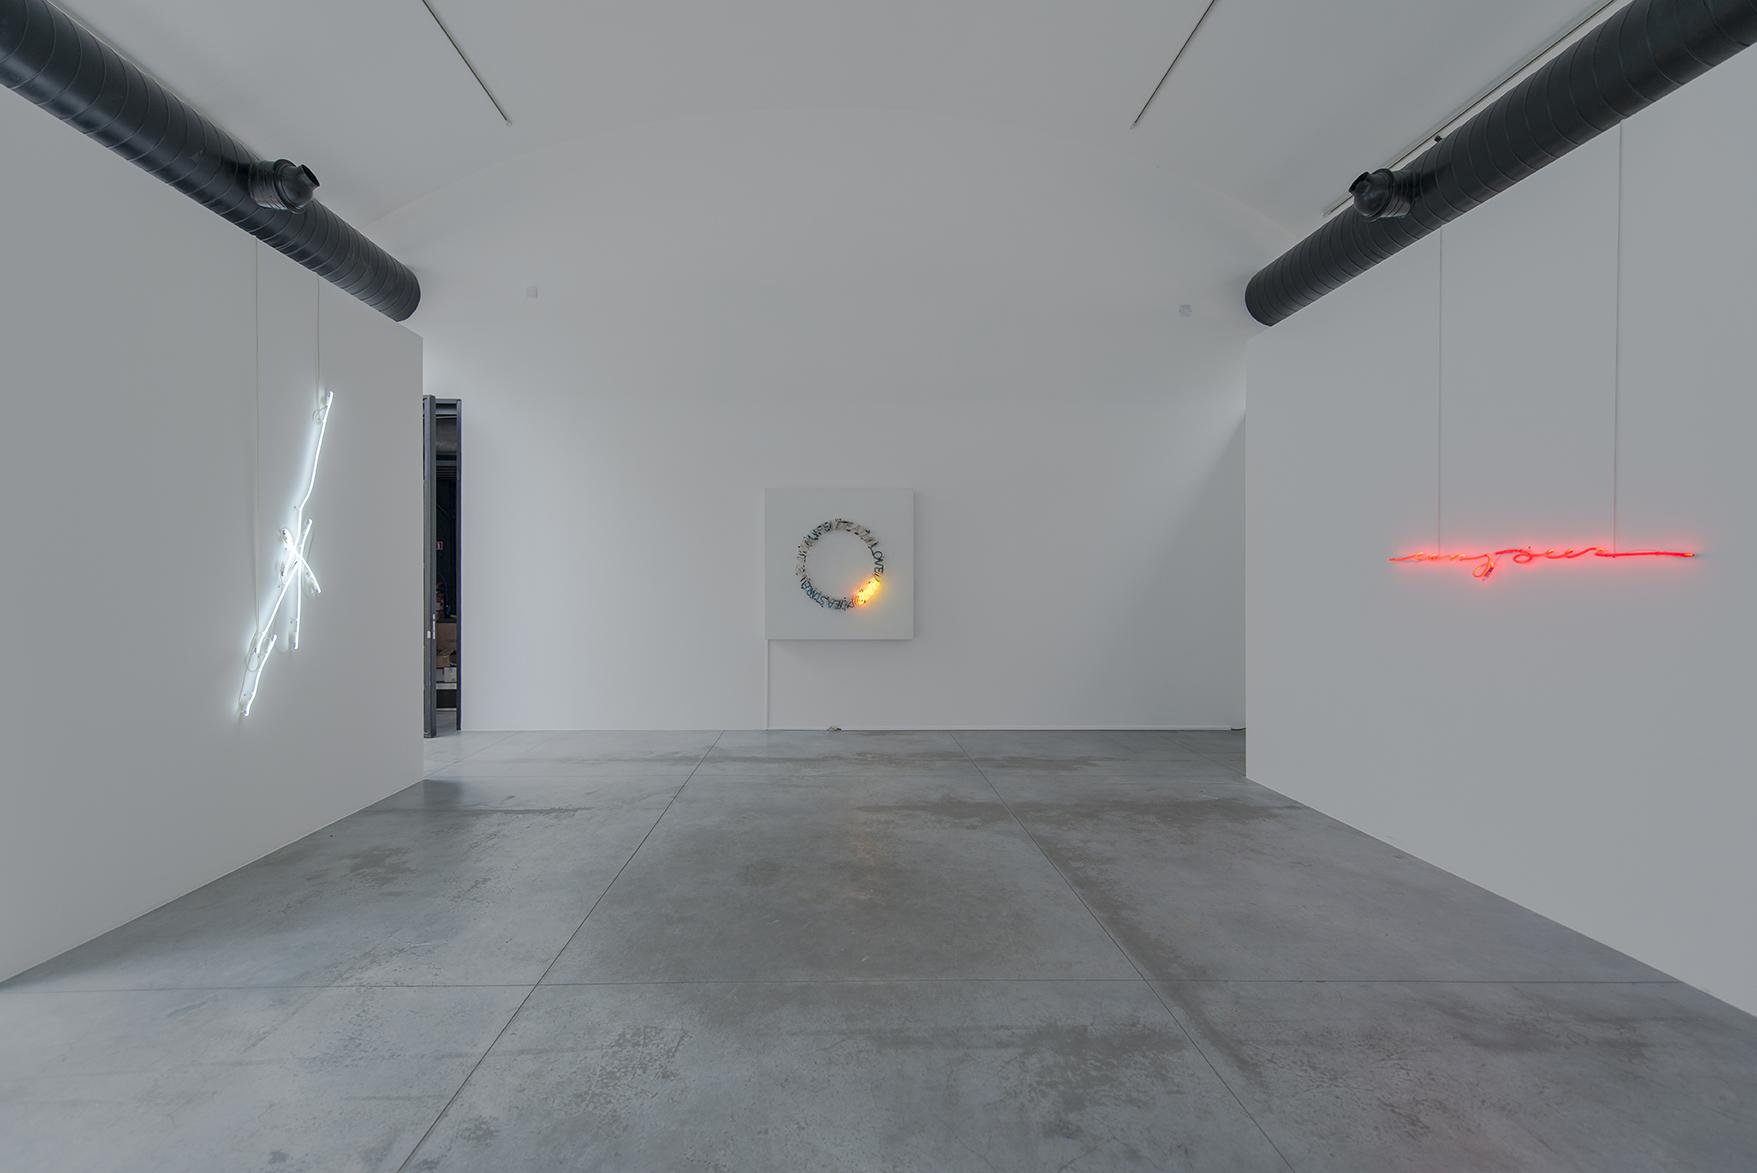 Shaping Light  - curated by Albert Baronian, vue d'installation, Fondation CAB. David Brognon & Stéphanie Rollin, Bruce Nauman, Marie José Burki Photo credit: Isabelle Arthuis